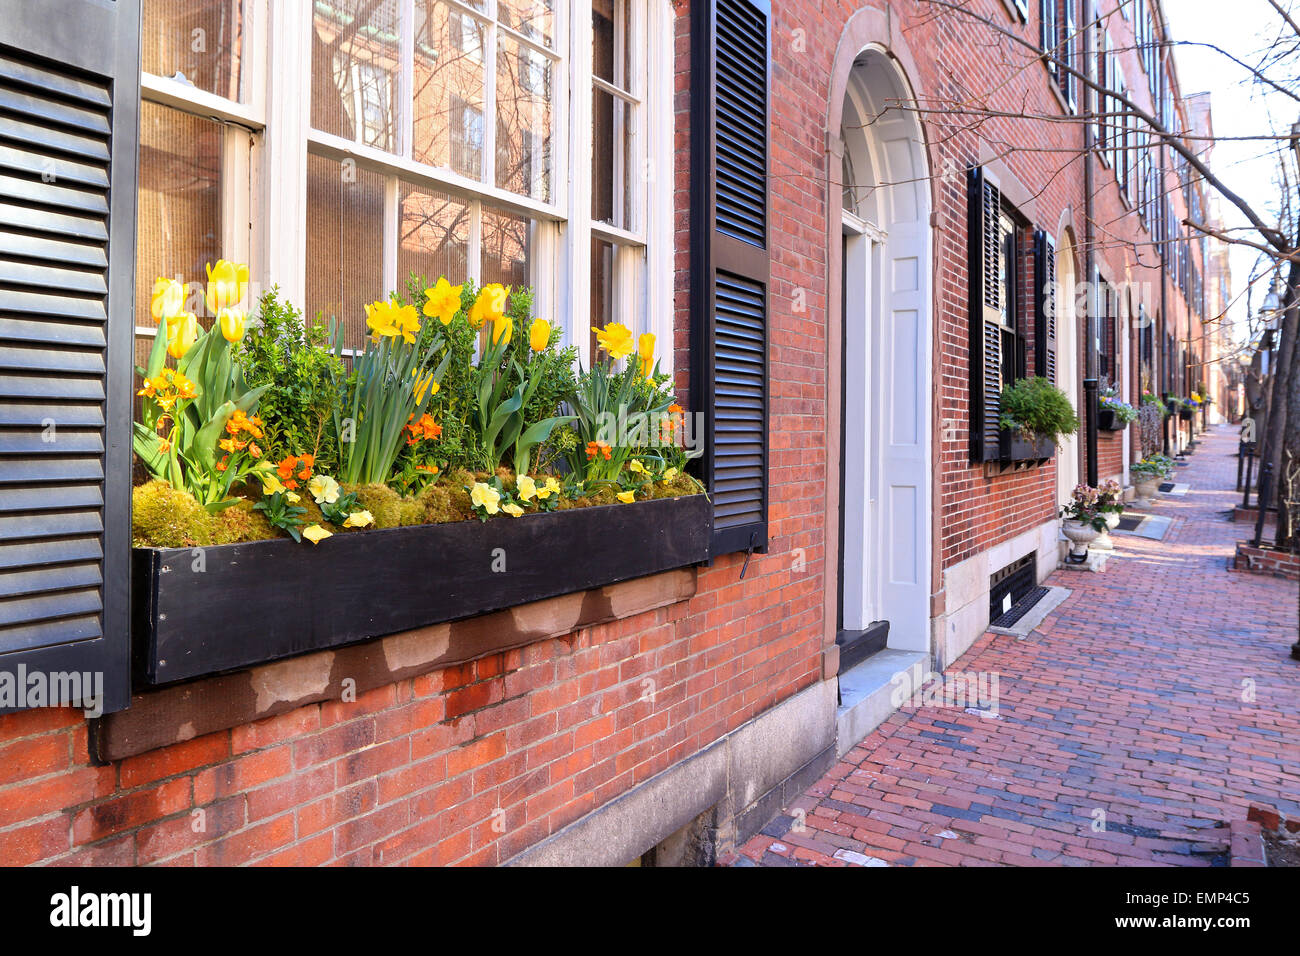 Boston Massachusetts Beacon Hill brick sidewalk with front door and Stock Photo 81621013 - Alamy & Boston Massachusetts Beacon Hill brick sidewalk with front door and ...